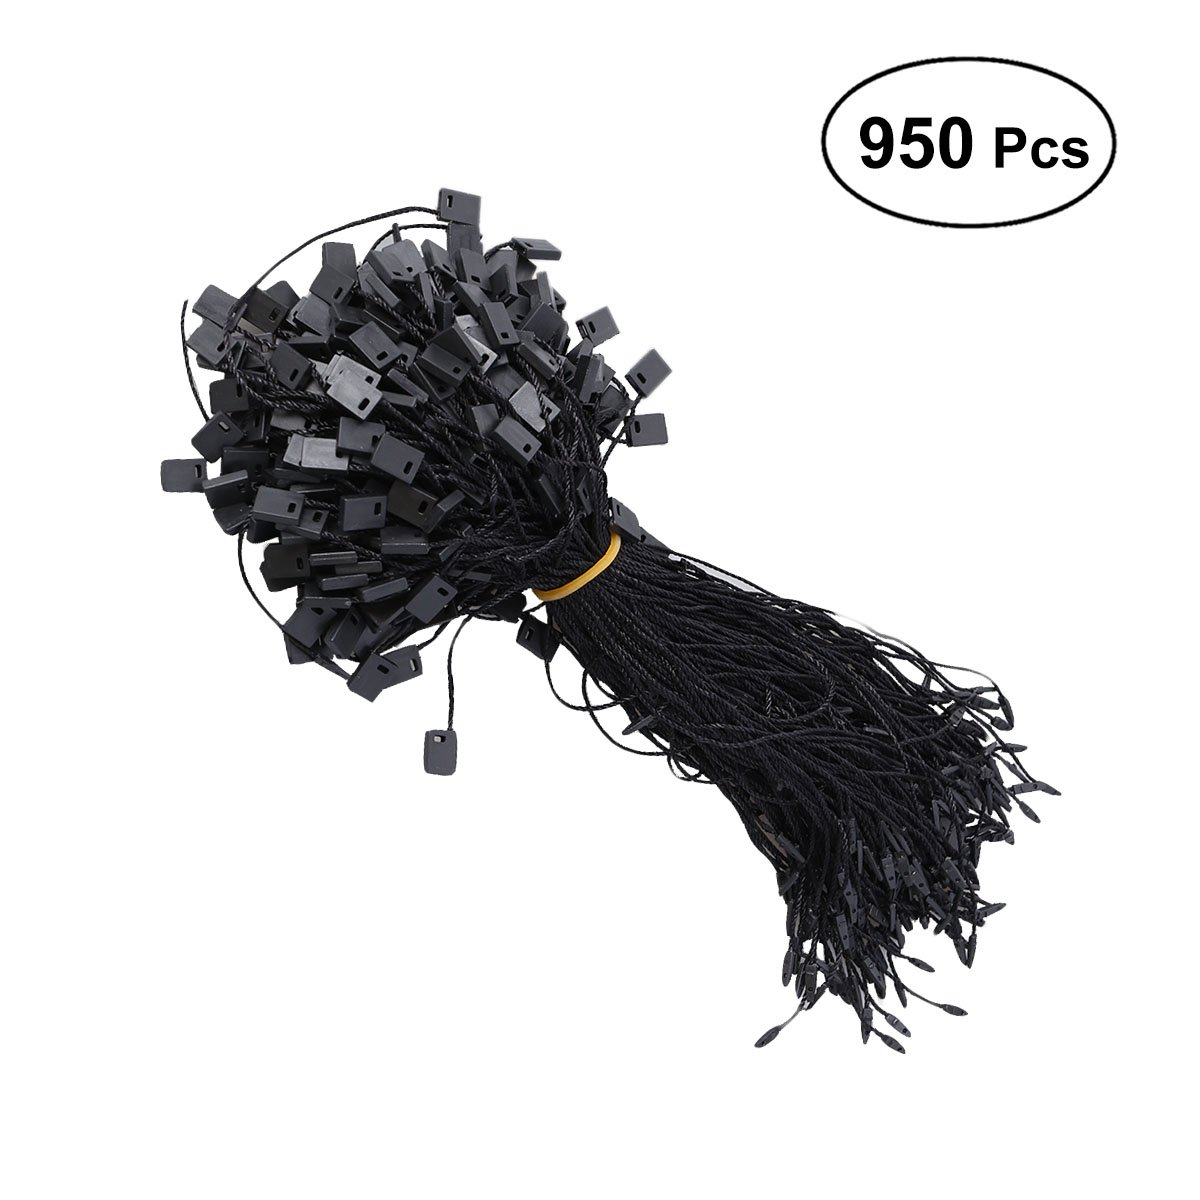 Healifty 950pcs Hang Tag Fasteners Label Hanging Rope String Snap Locks Pin Security Loop (Black)